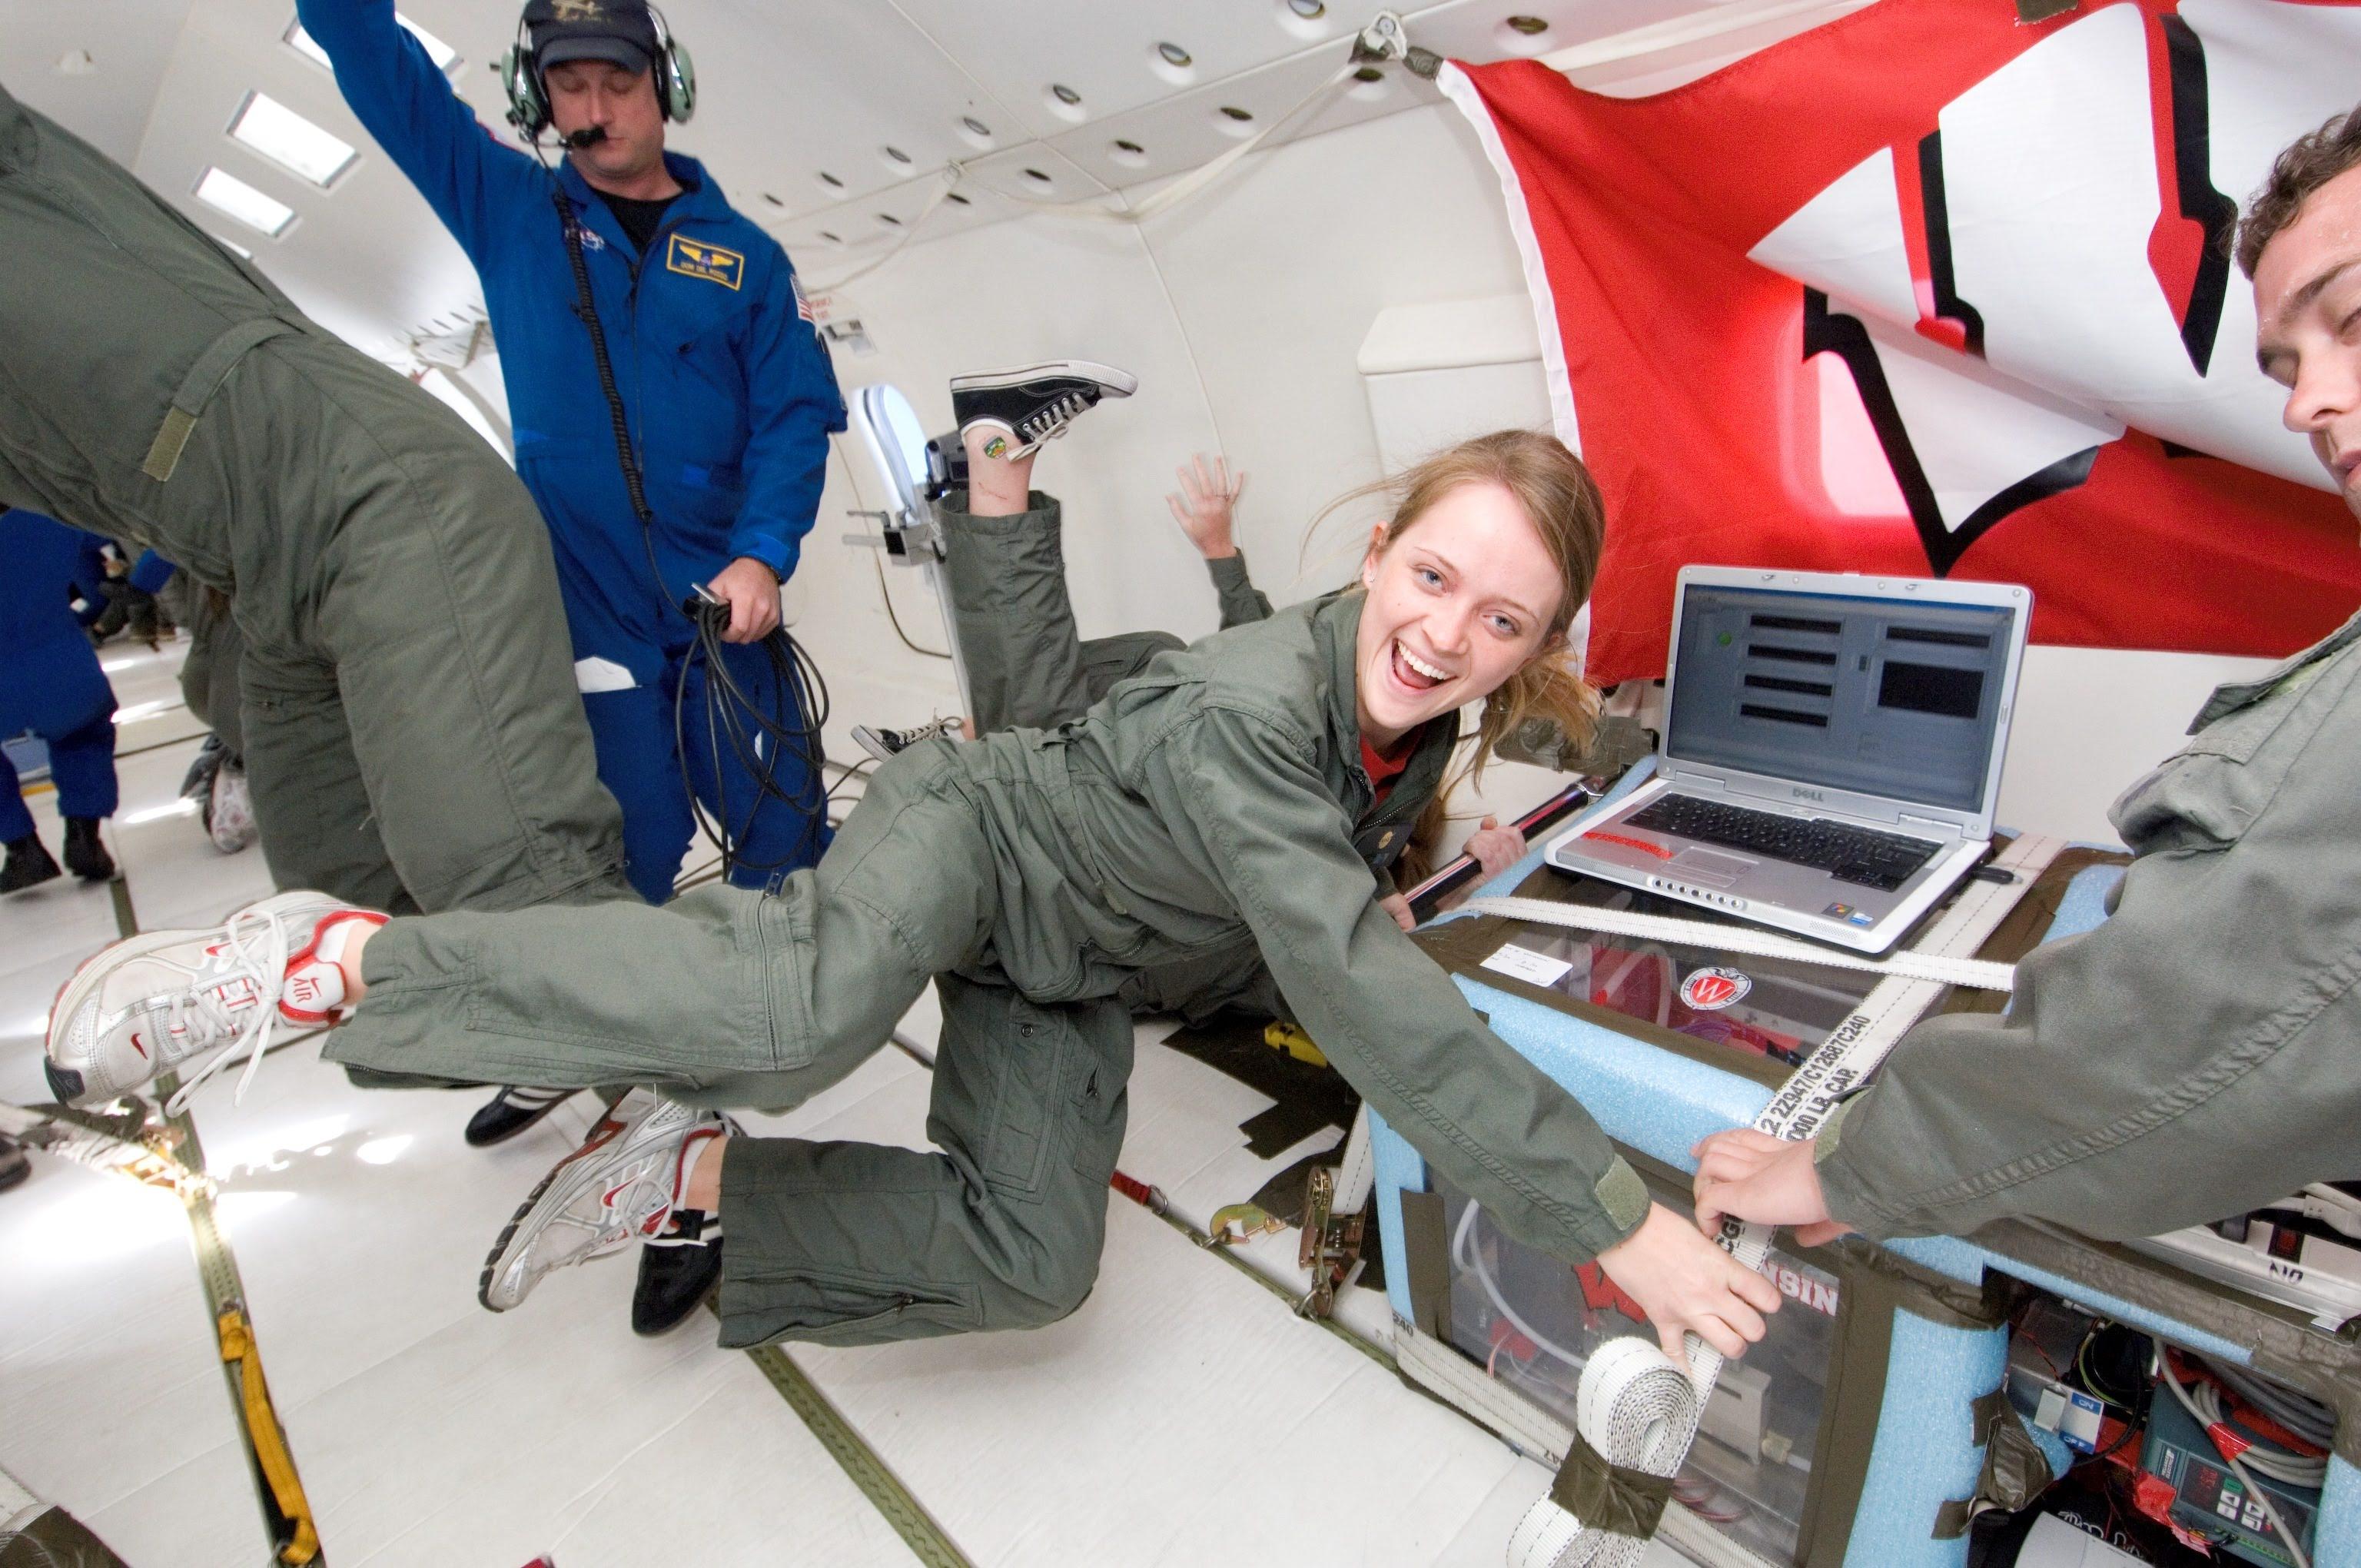 Lisa McGill in NASA's Zero Gravity Weightless Lab. Image courtesy of Lisa McGill.